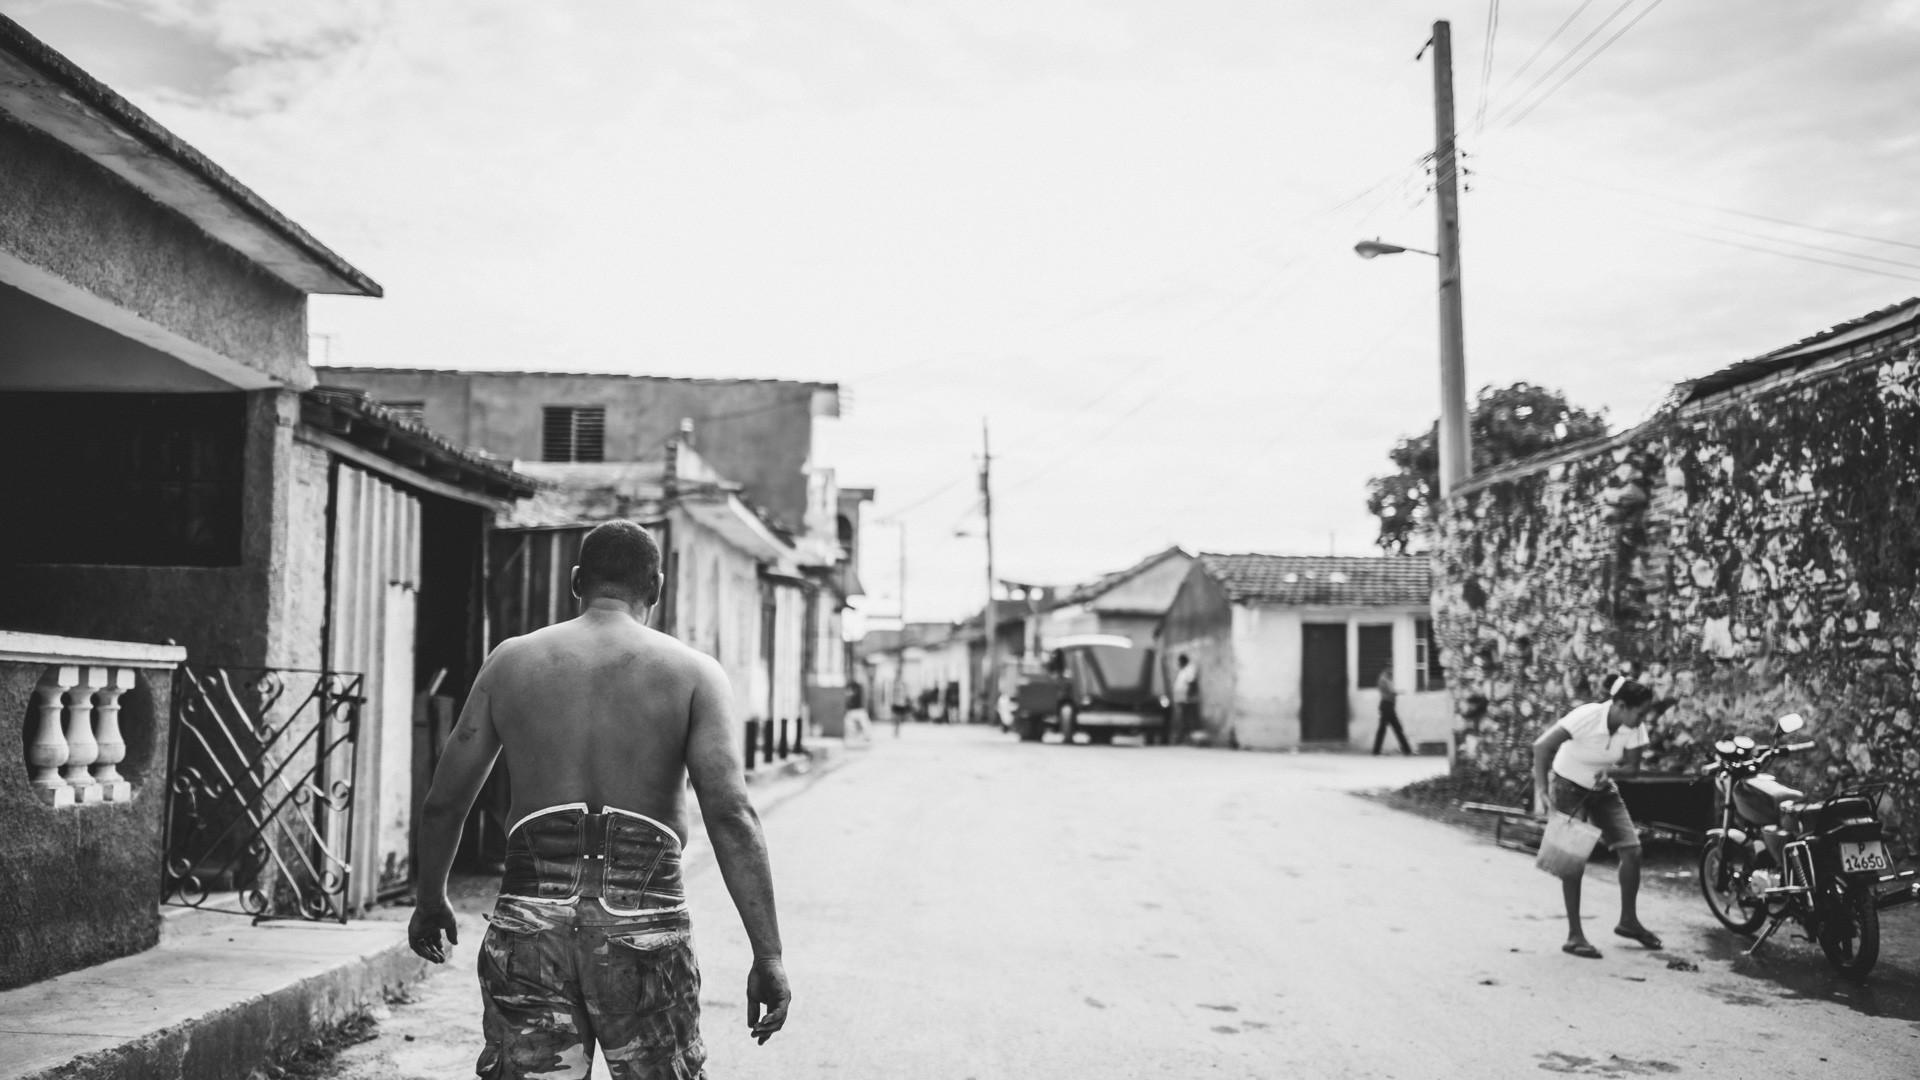 Damien-Dohmen-Photographe-Cuba-36